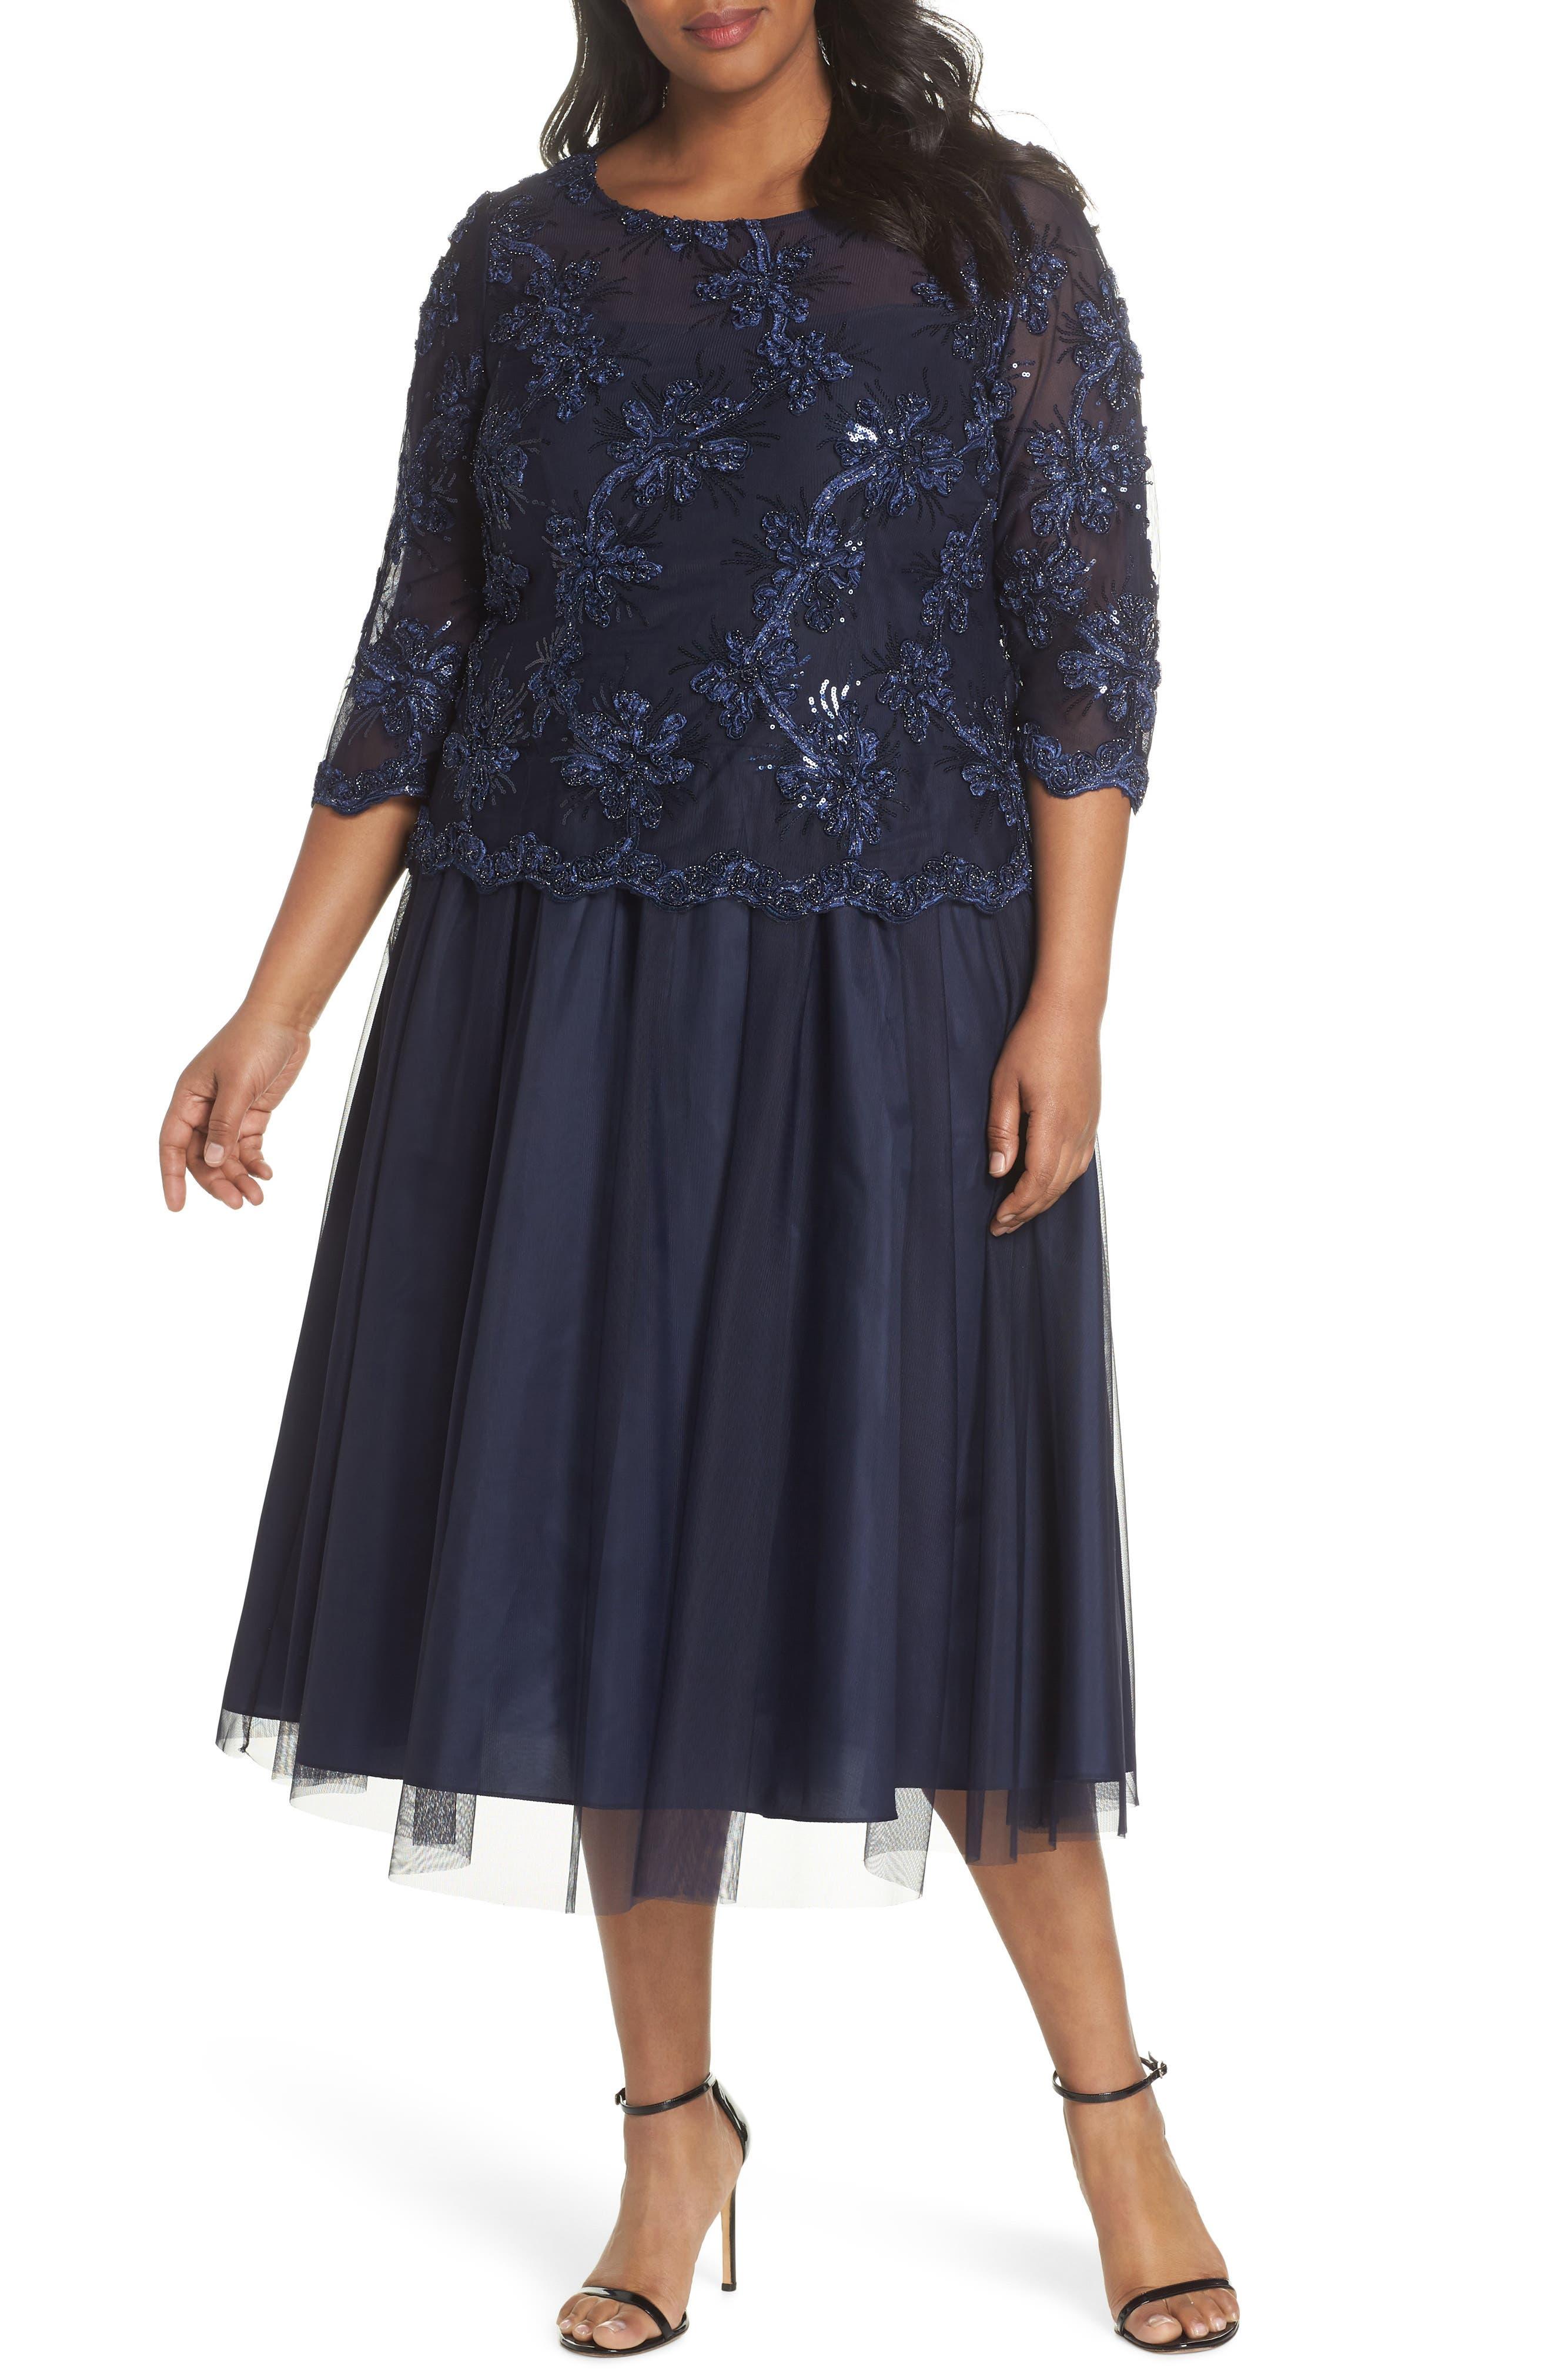 Embellished Bodice Tea Length Mesh Dress,                             Main thumbnail 1, color,                             Navy